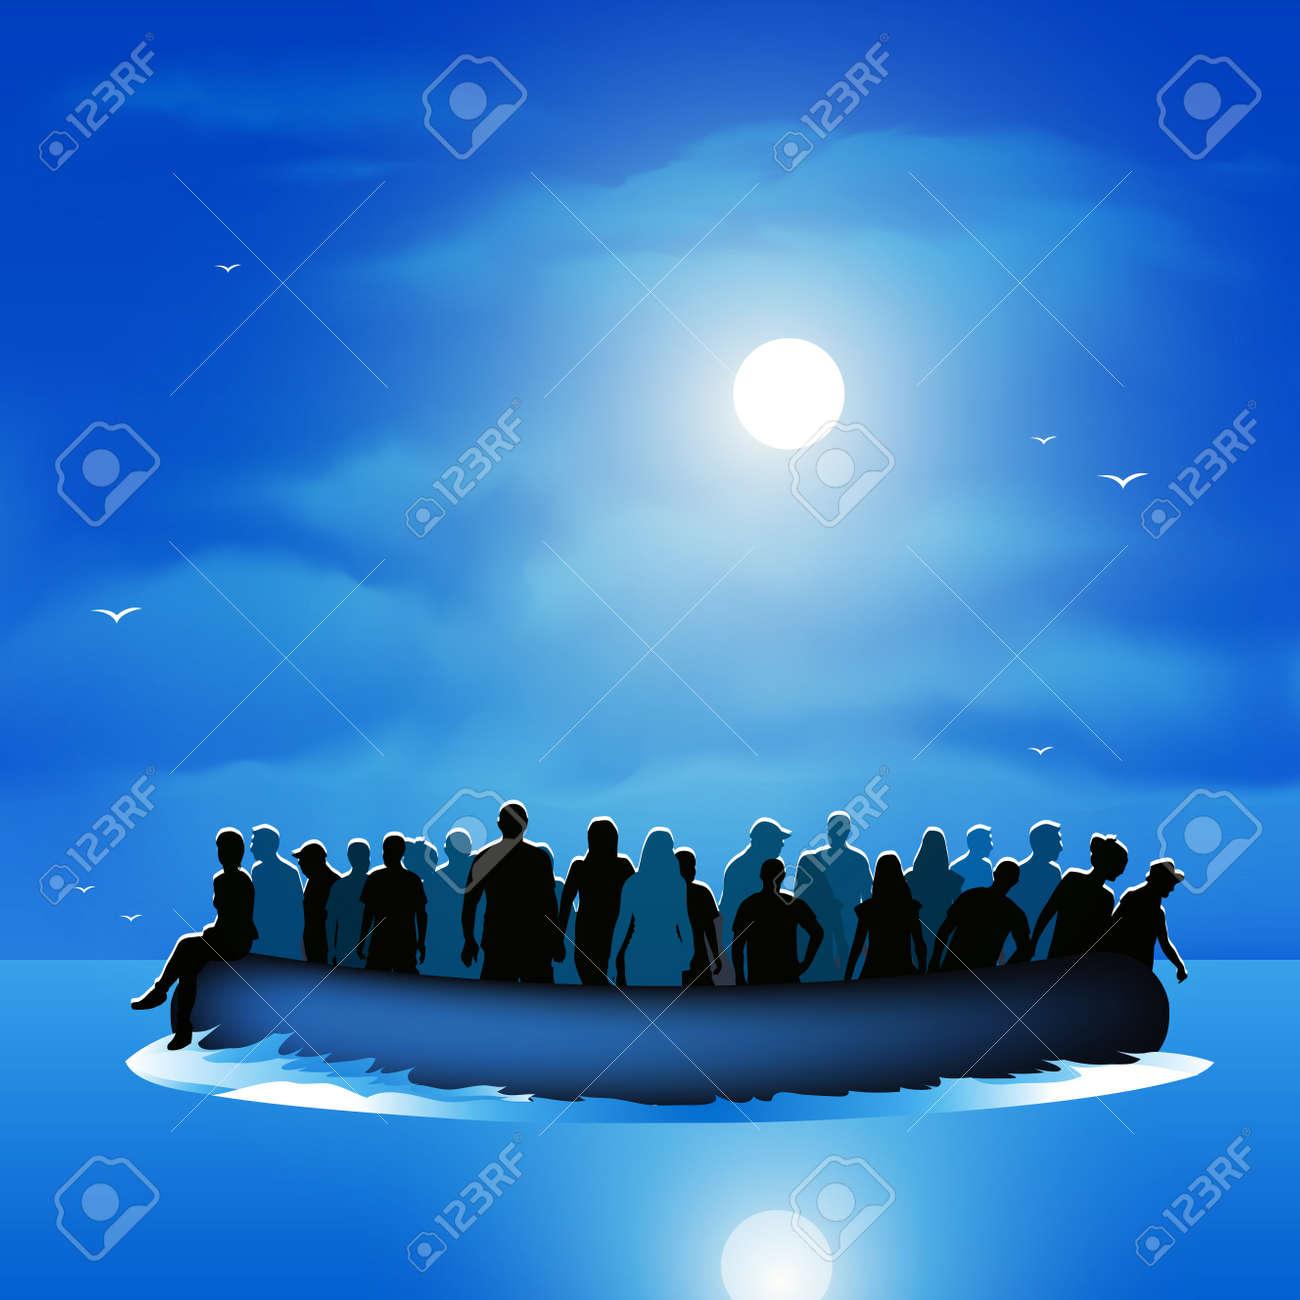 Dangerous journey refugees risking lives to find new life. Vector illustration - 46081434